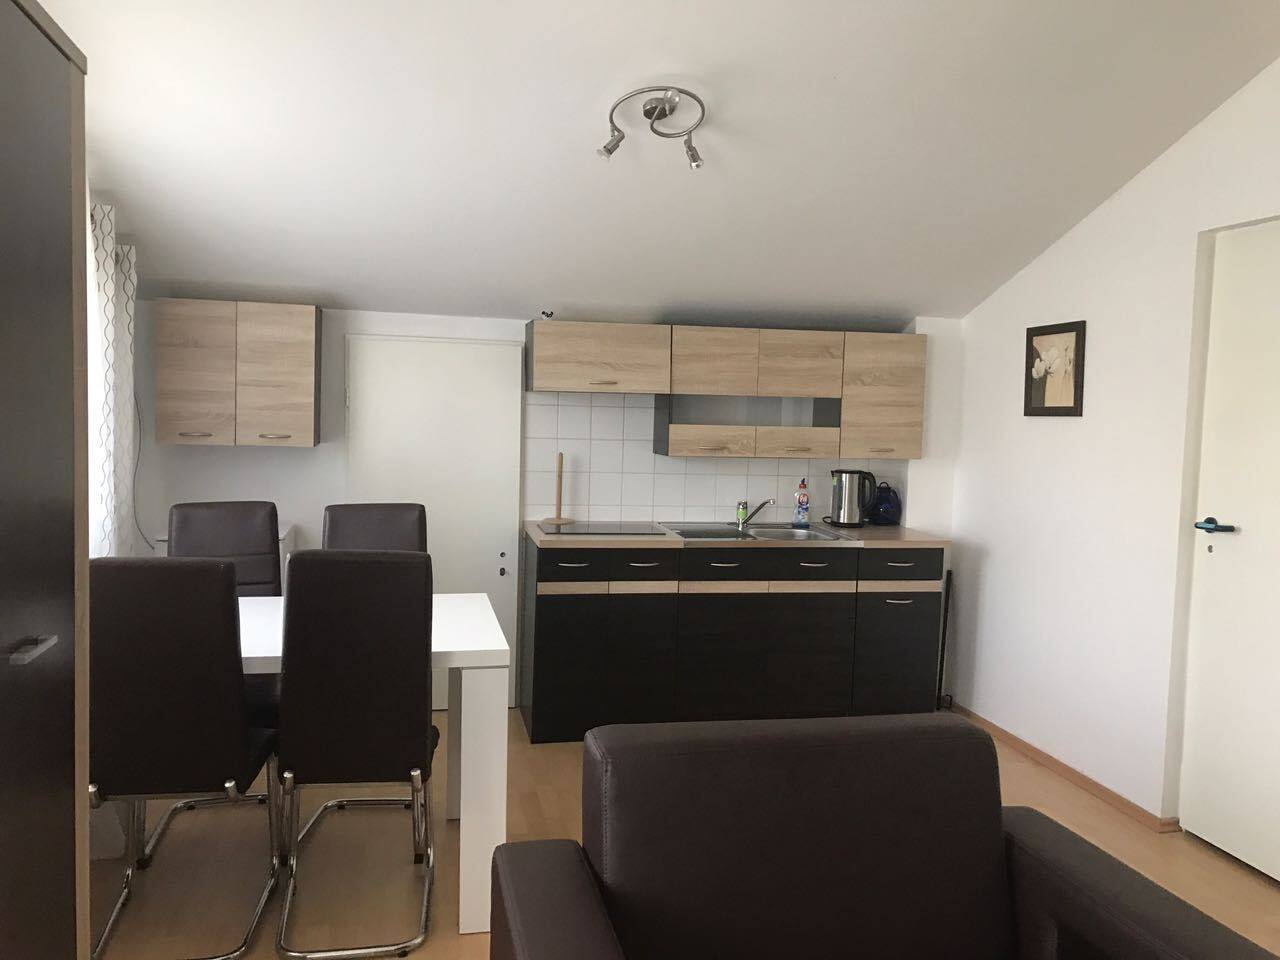 2 Zimmer Appartement, 2 Bäder, S15. - Apartments for Rent in ...